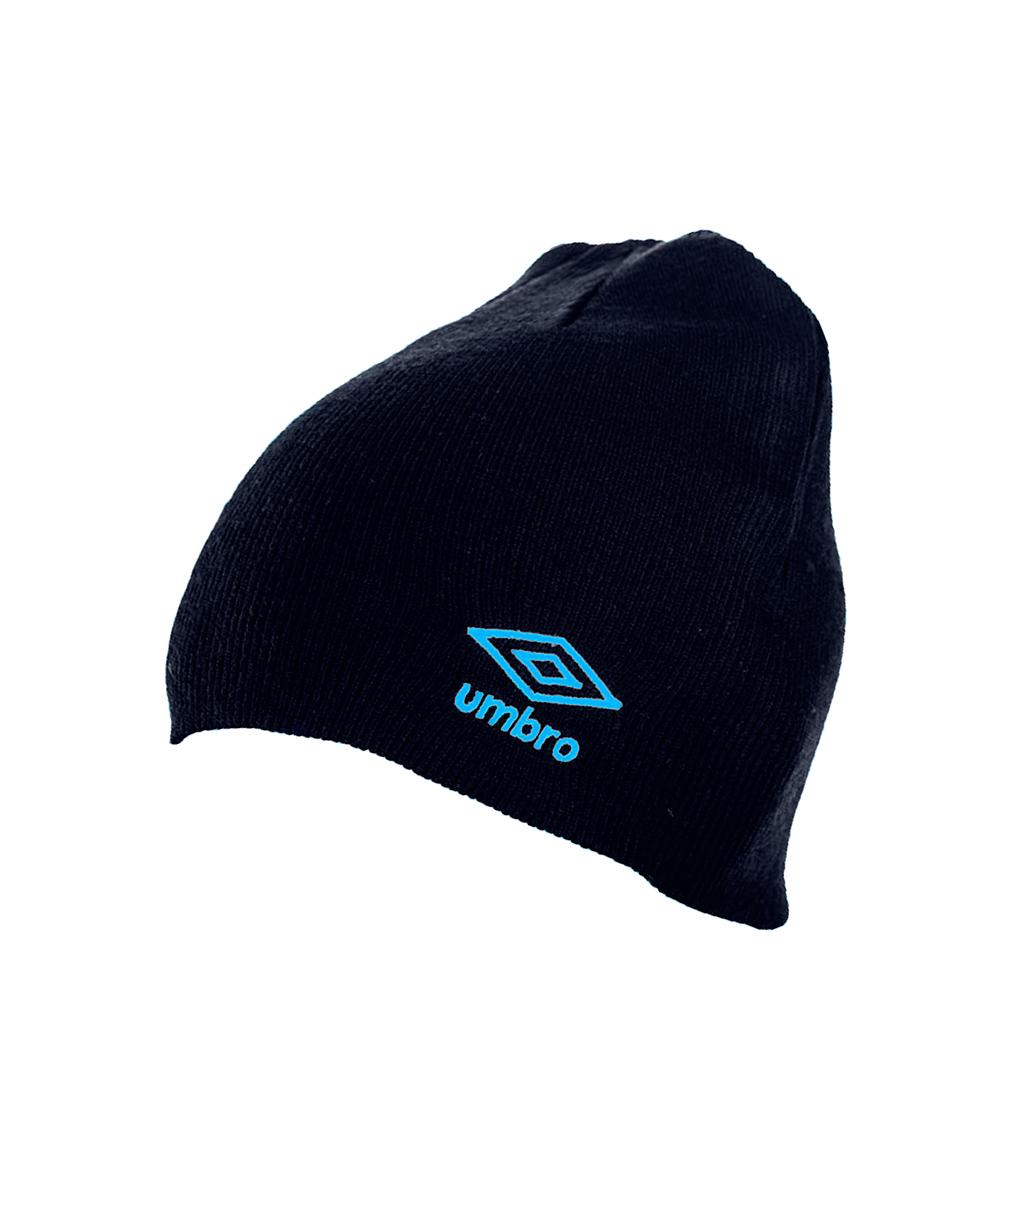 Тёмно-синяя шапка umbro 62594U